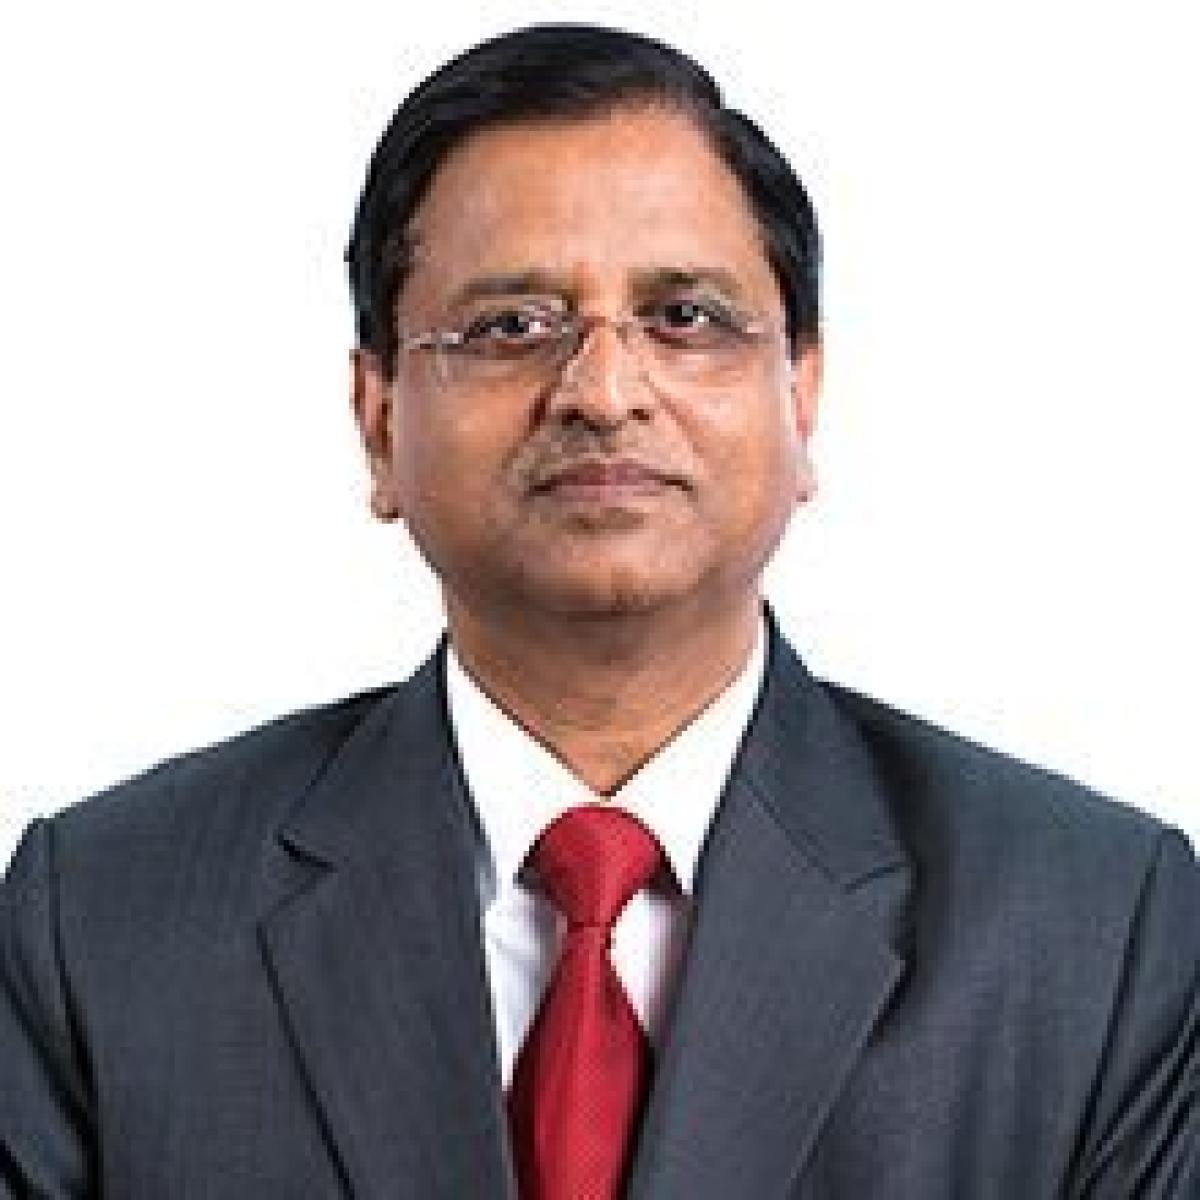 Economic Affairs Secretary Subhash Chandra Garg. (pic @SecretaryDEA)